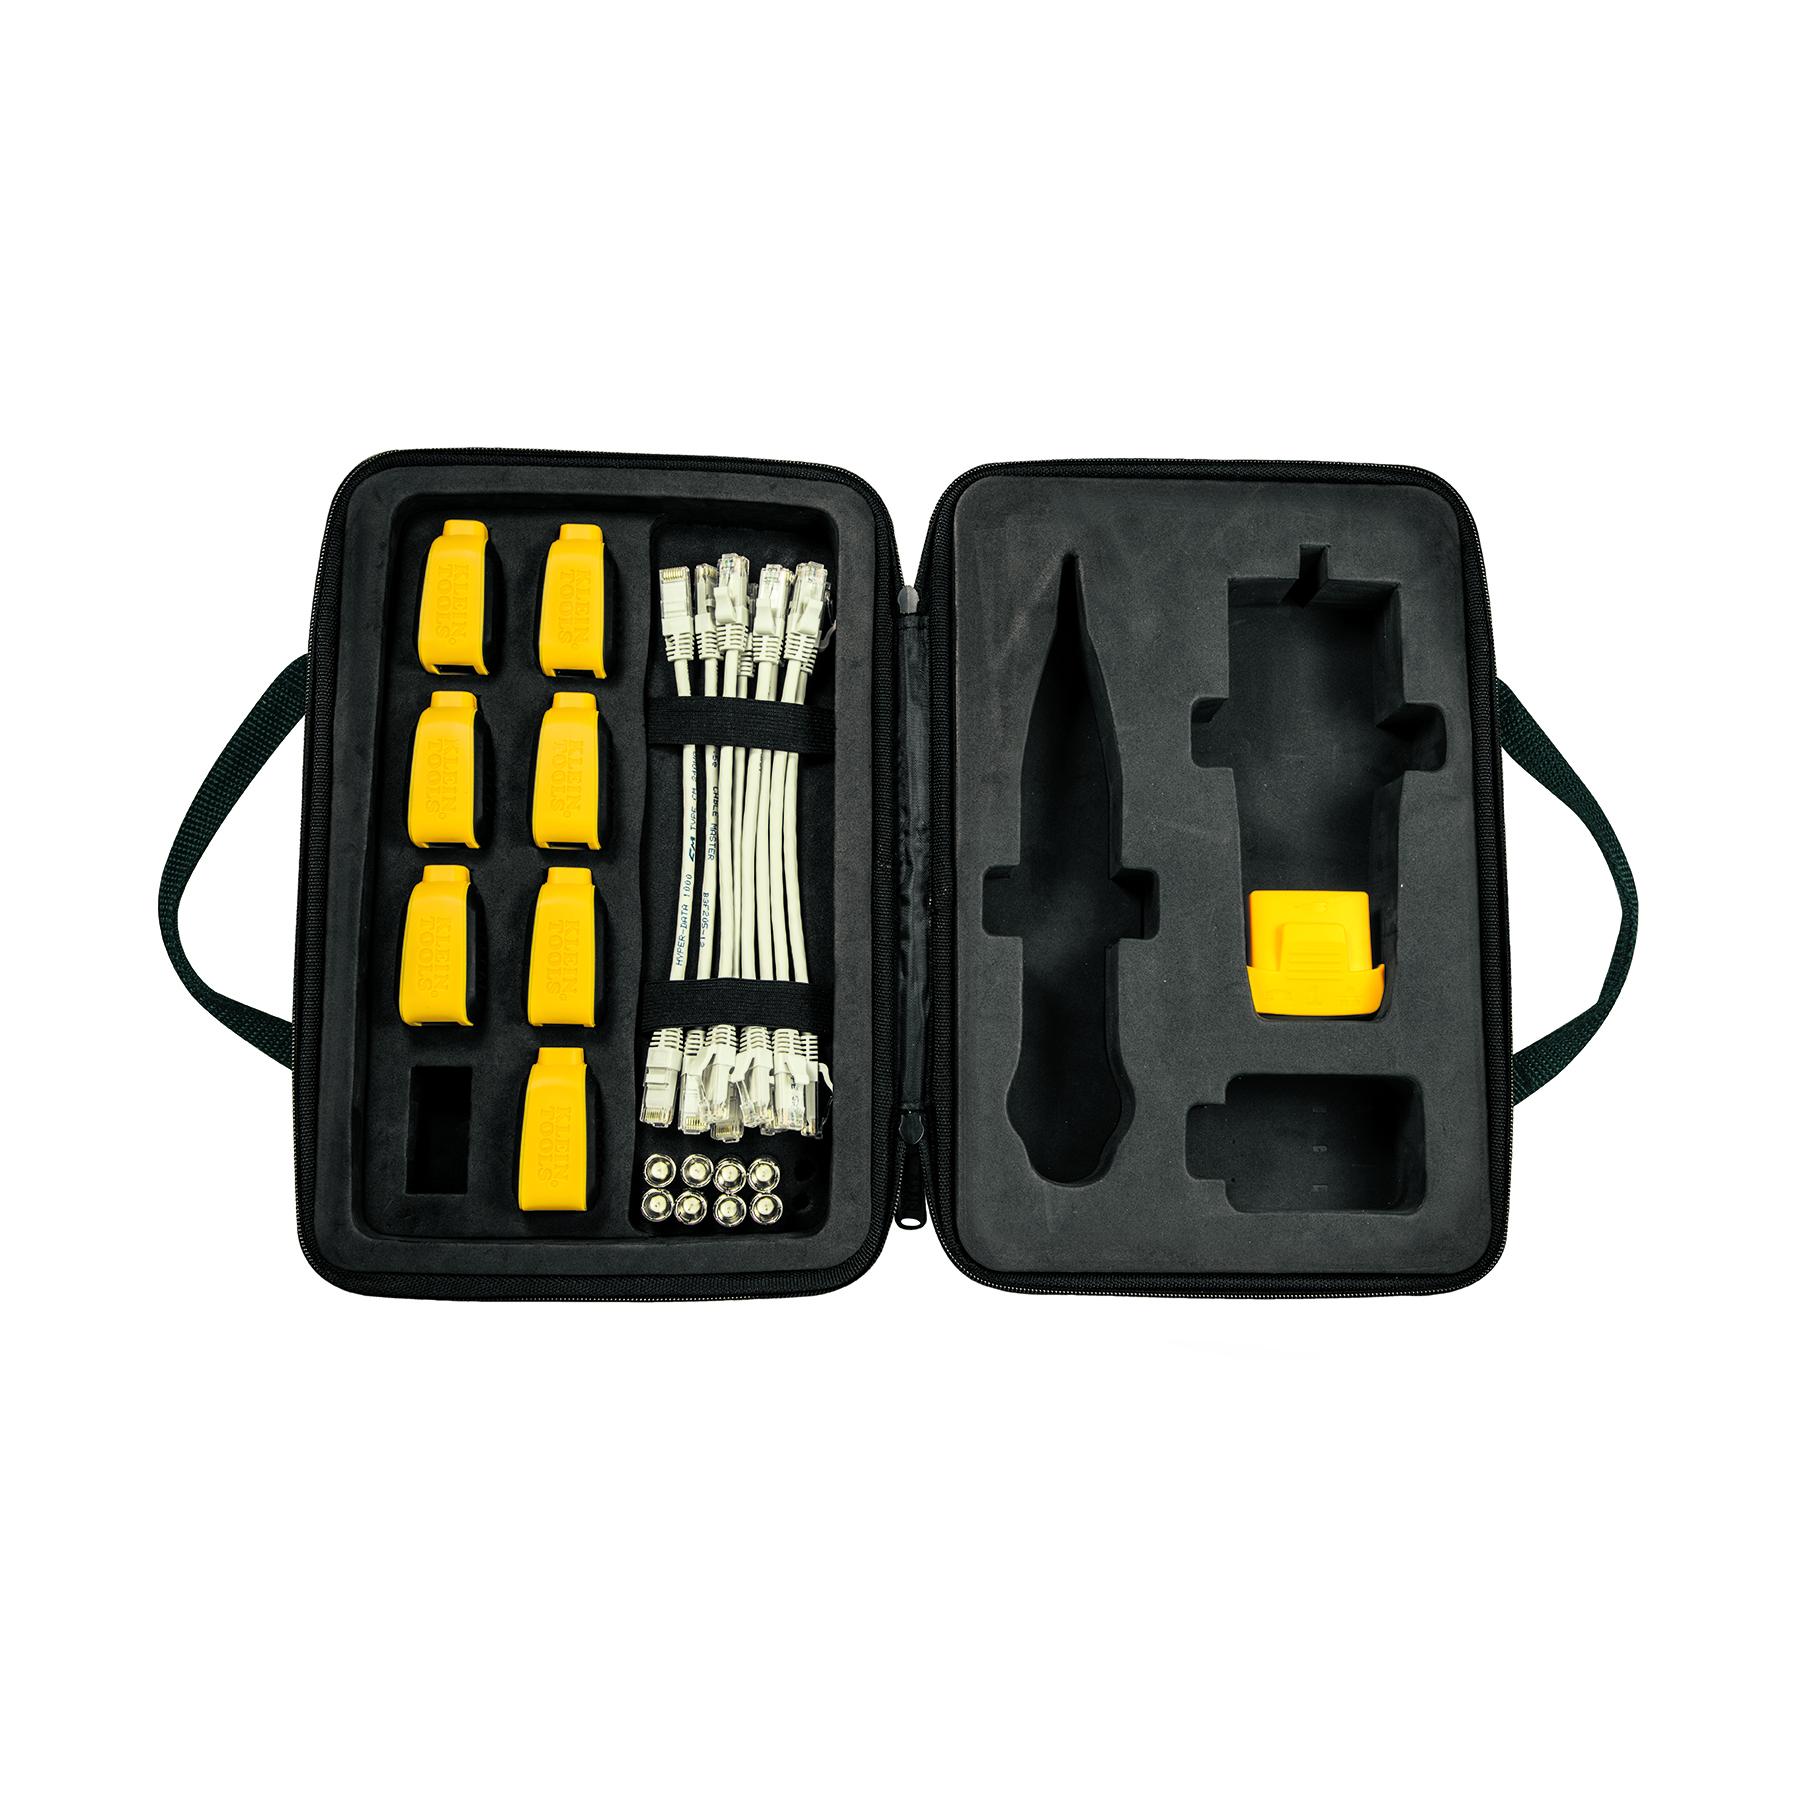 klein tools vdv scout pro 2 manual